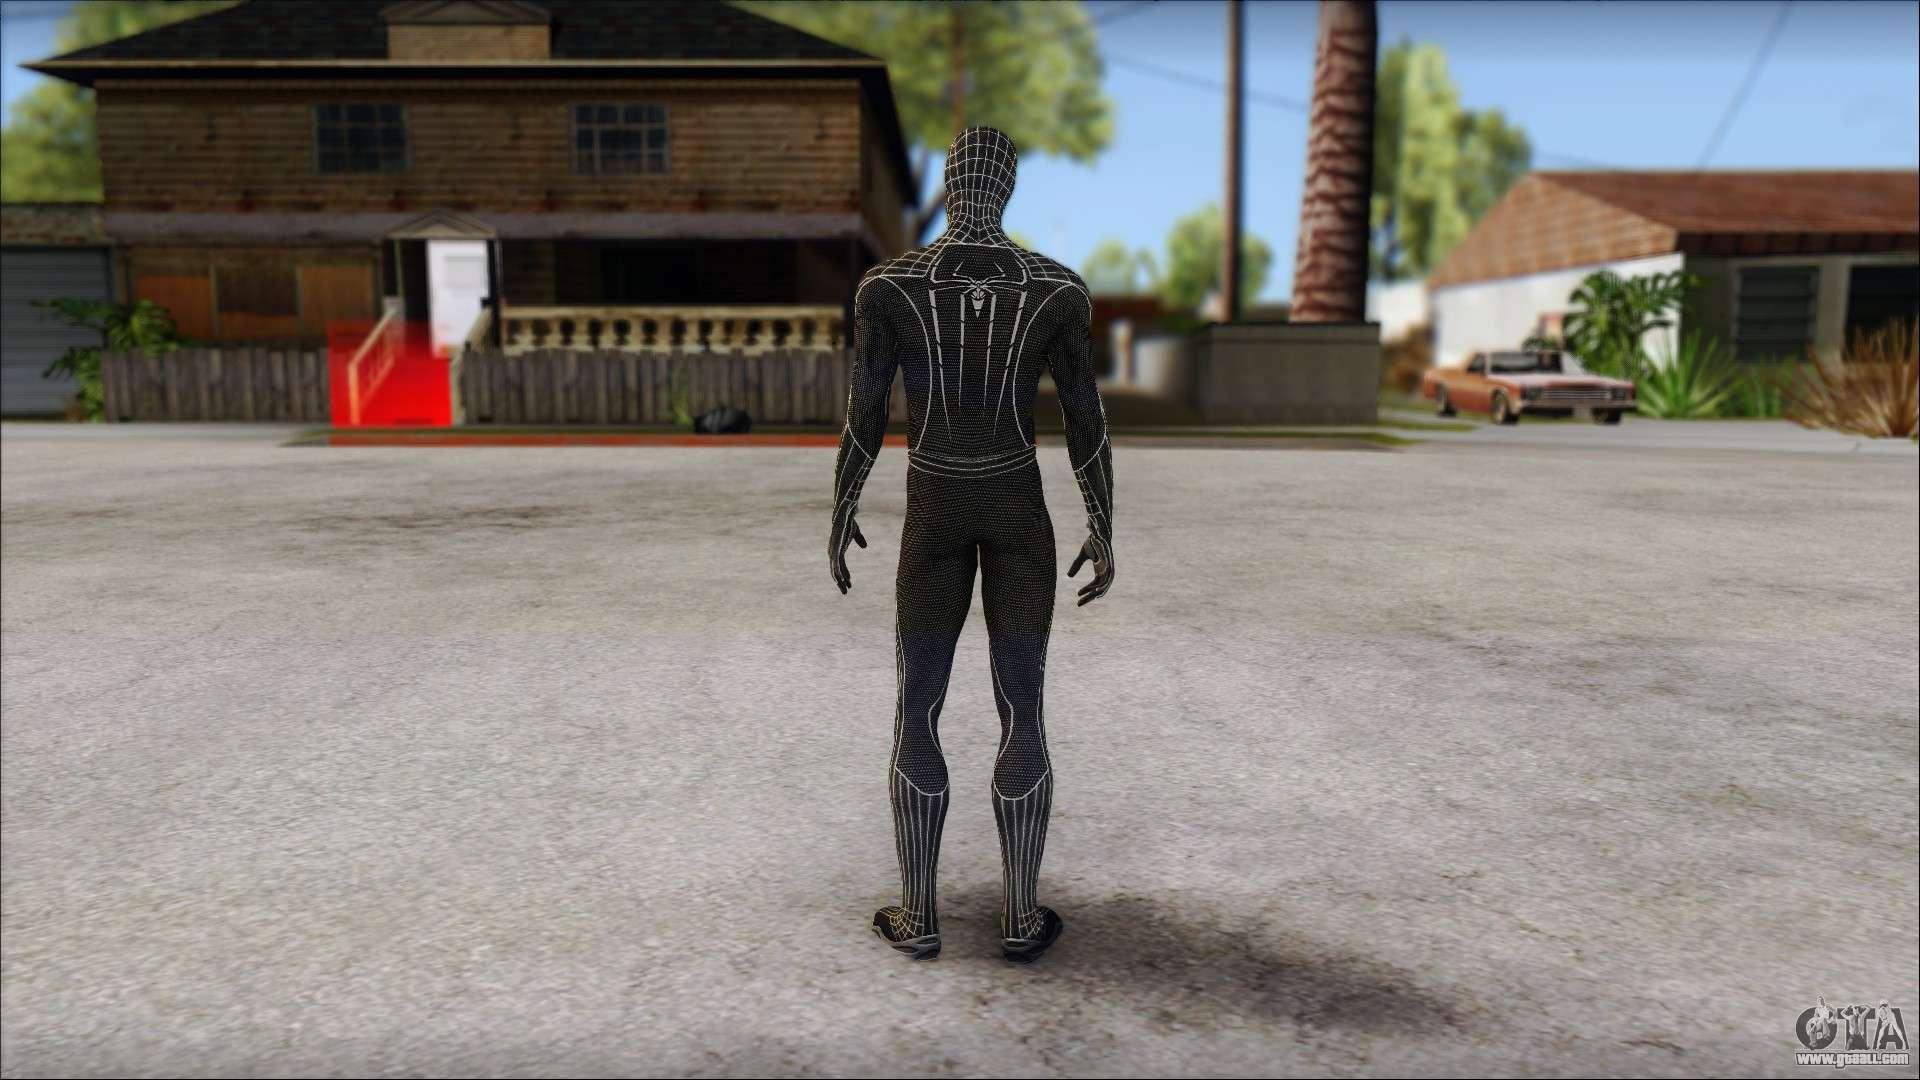 Free Download Spiderman 3 Mod For Gta San Andreas - froglivin